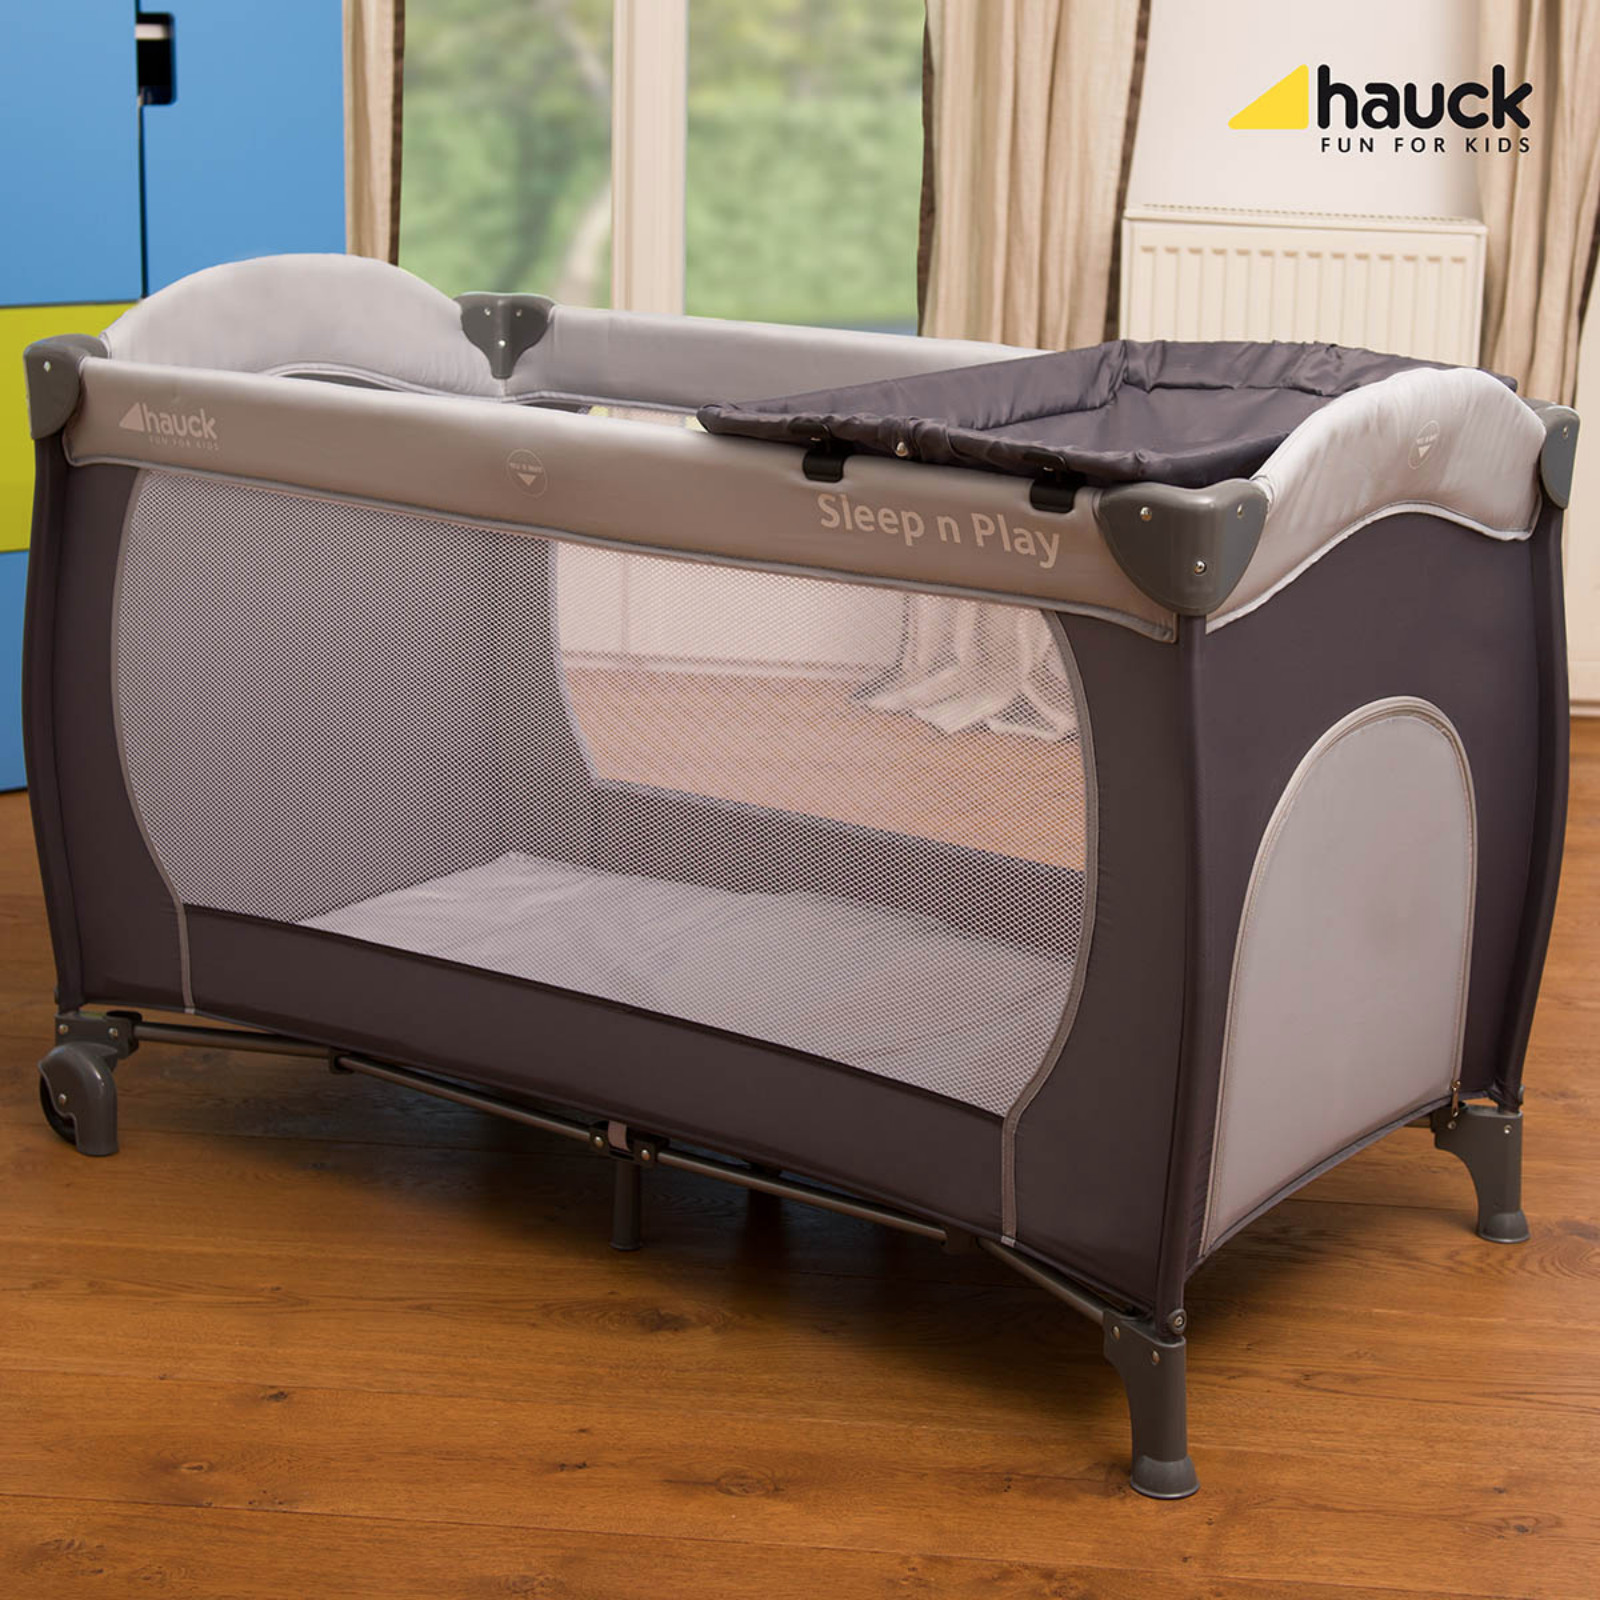 Hauck Sleep N Play Center Bassinette Travel Cot Playpen